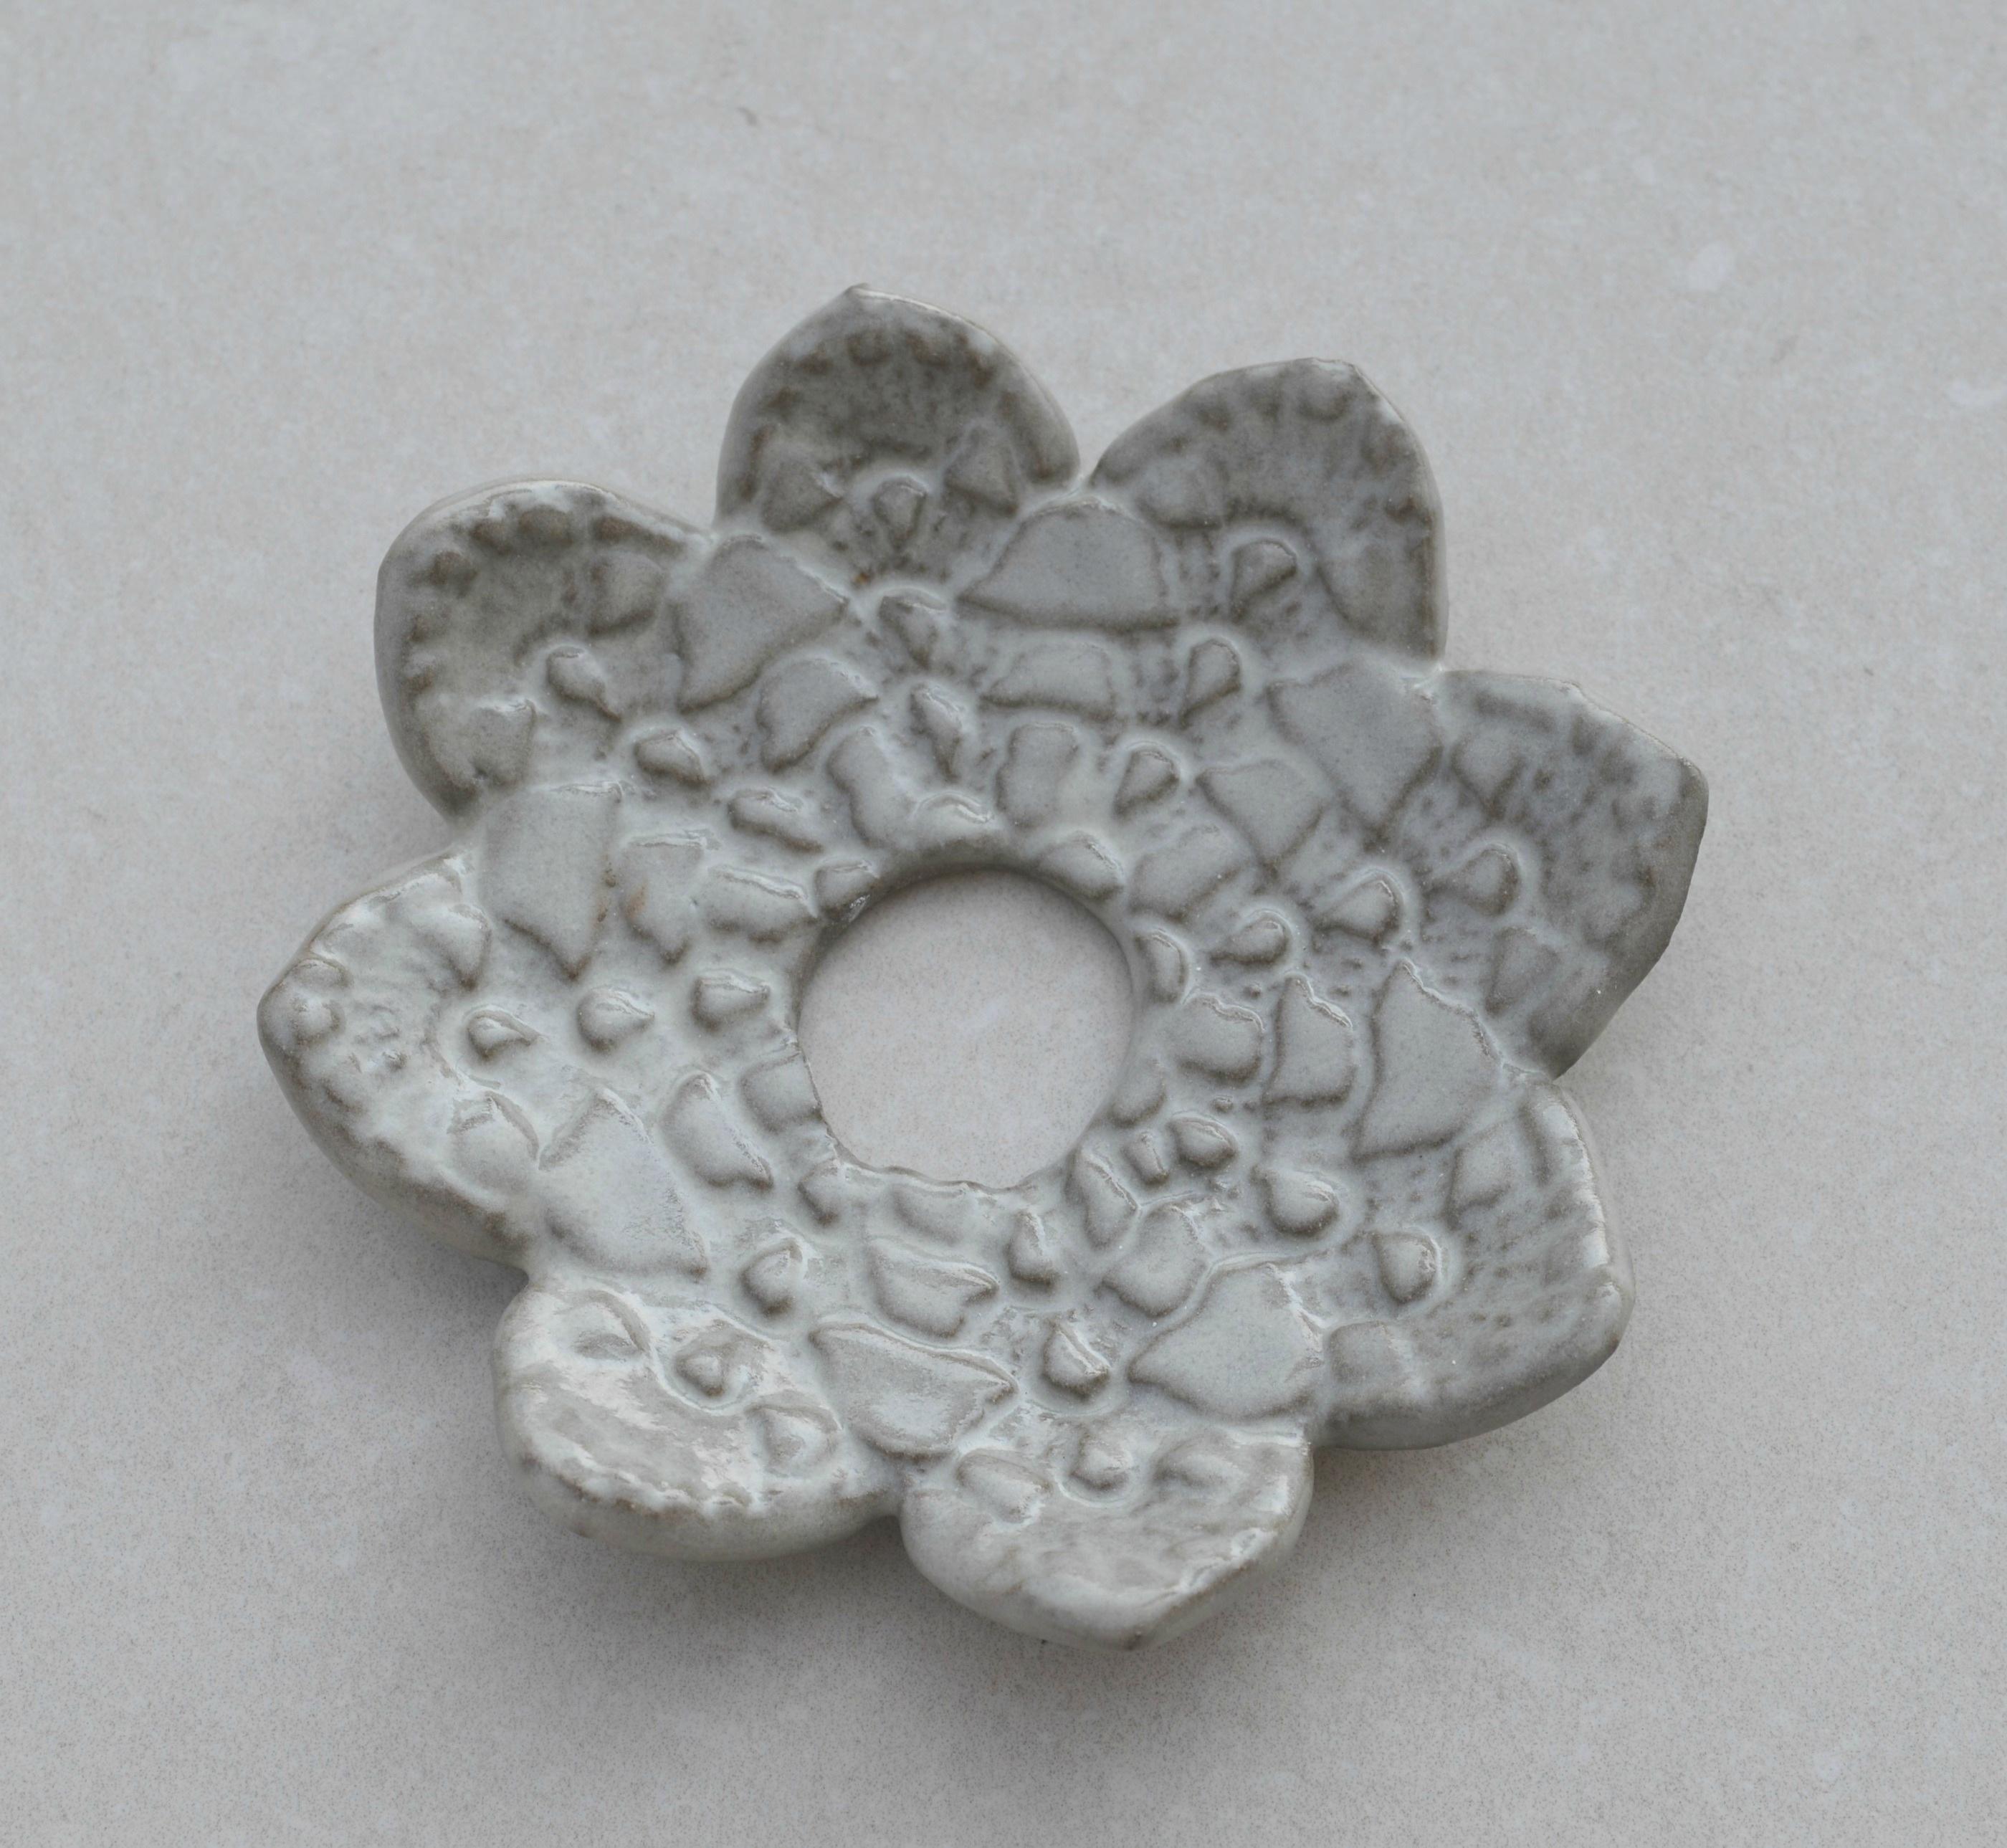 Ljusmanschett, antracit lera